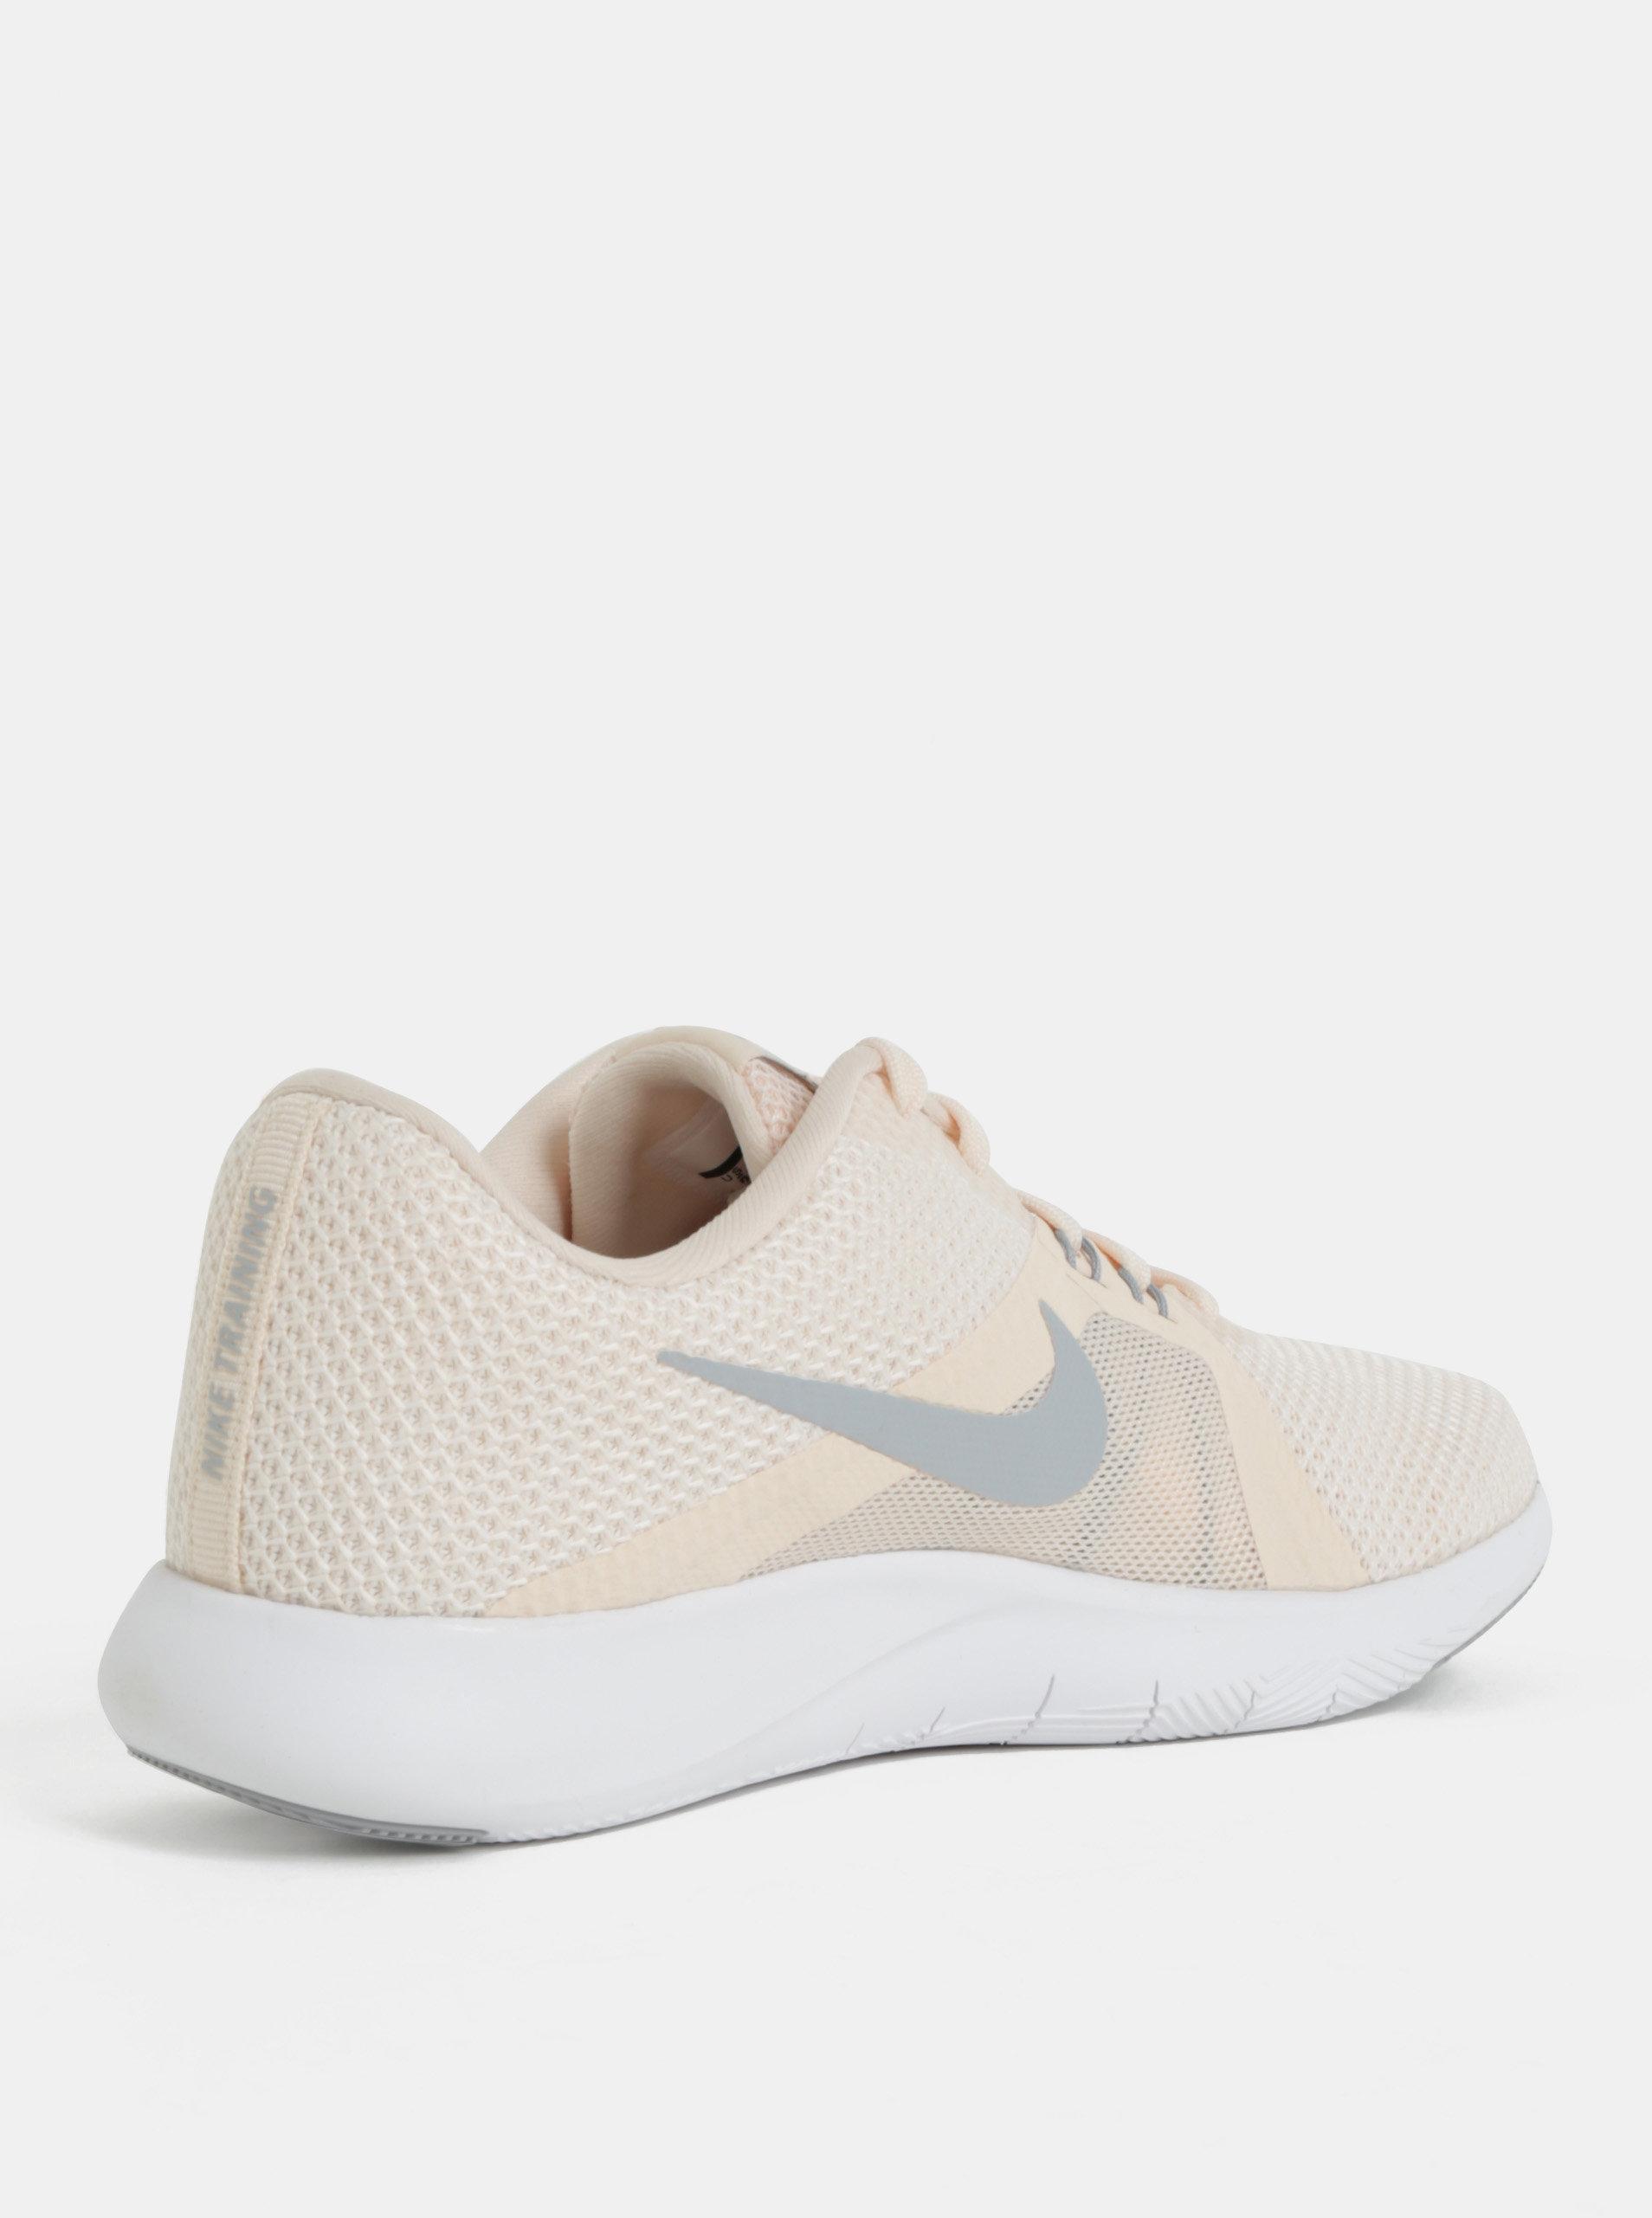 0df7a0d40 Ružové dámske tenisky Nike Flex trainer 8 | ZOOT.sk